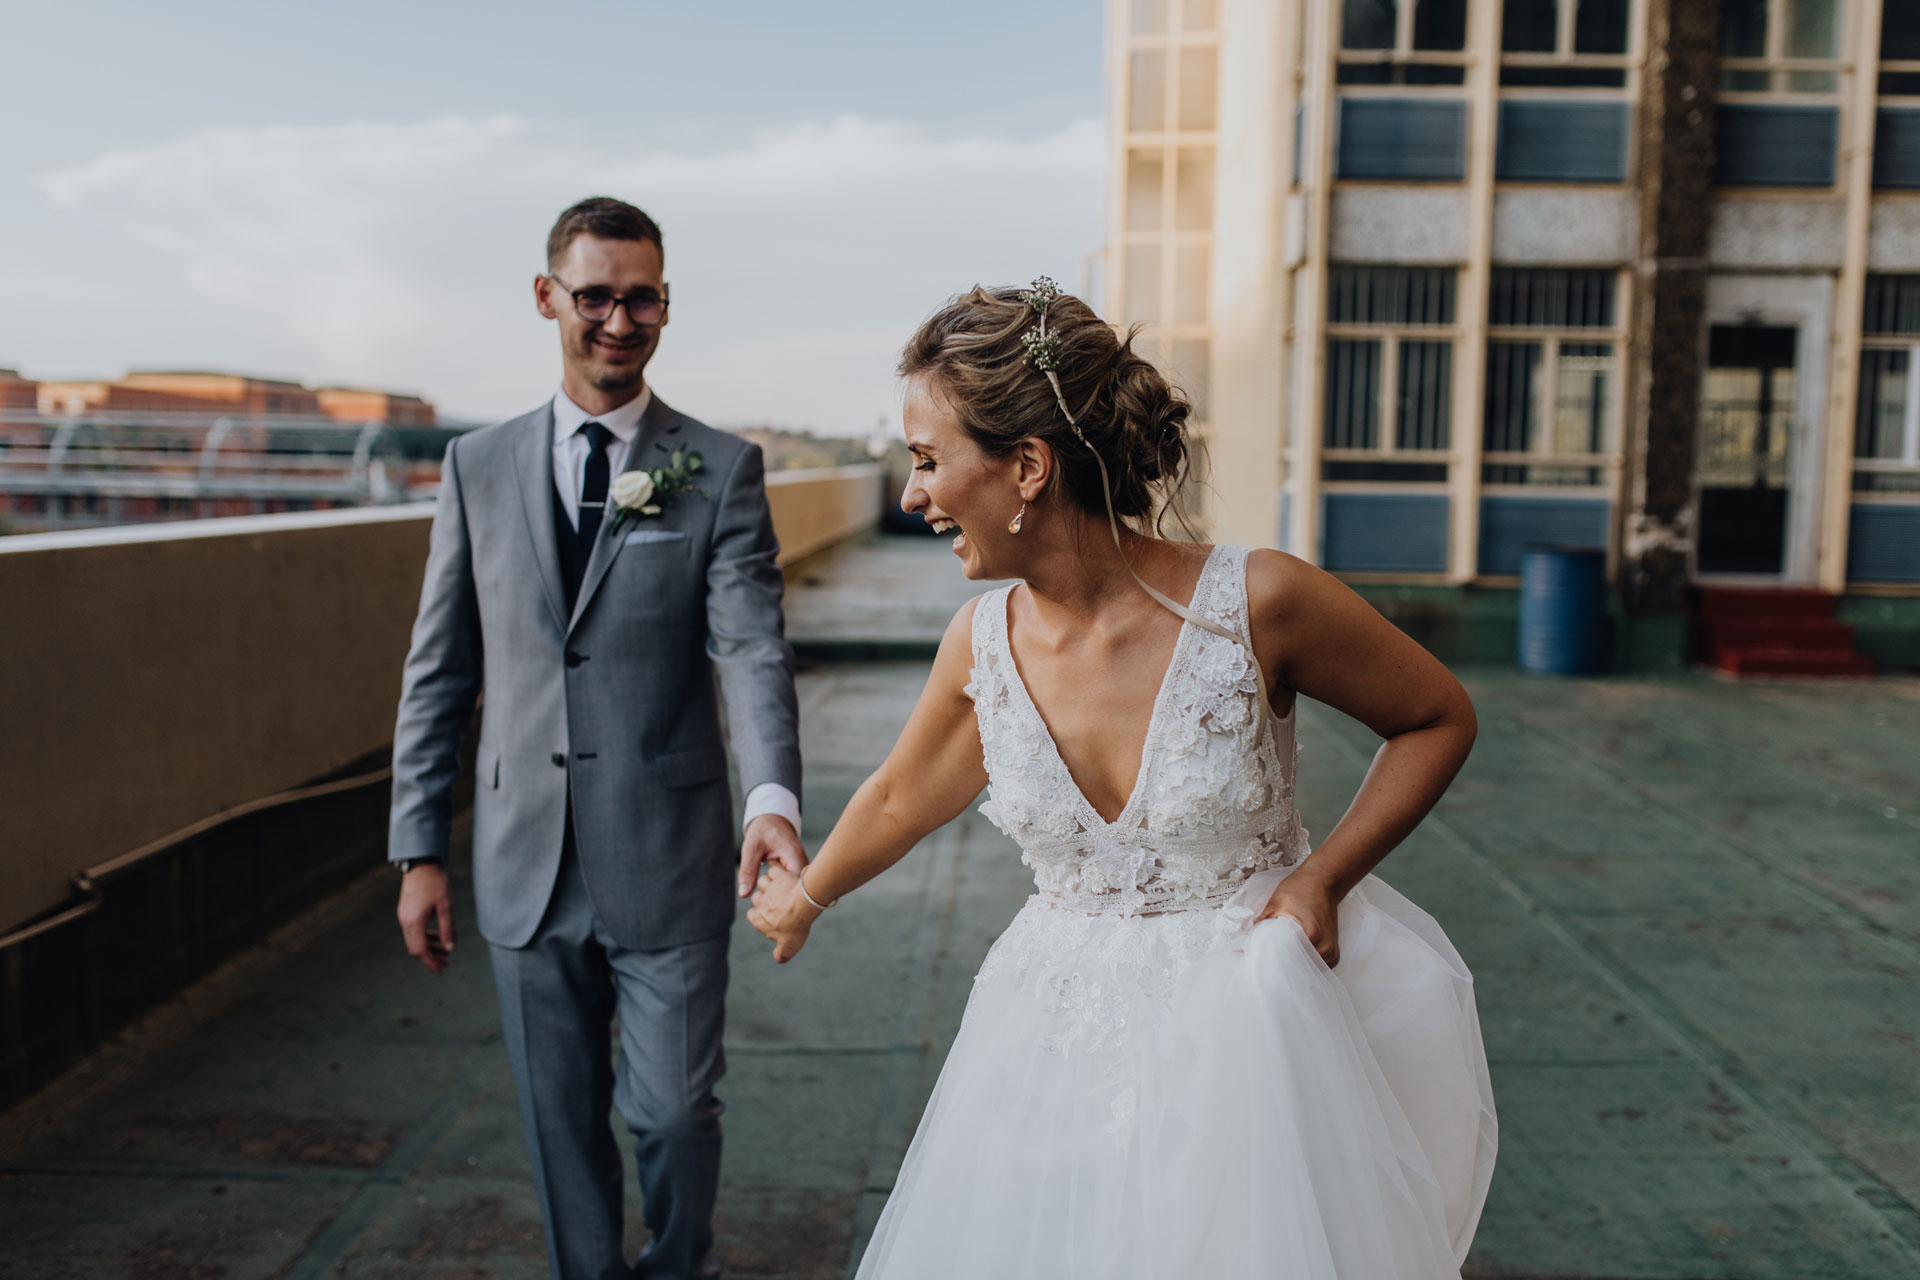 Okay Deer - wedding